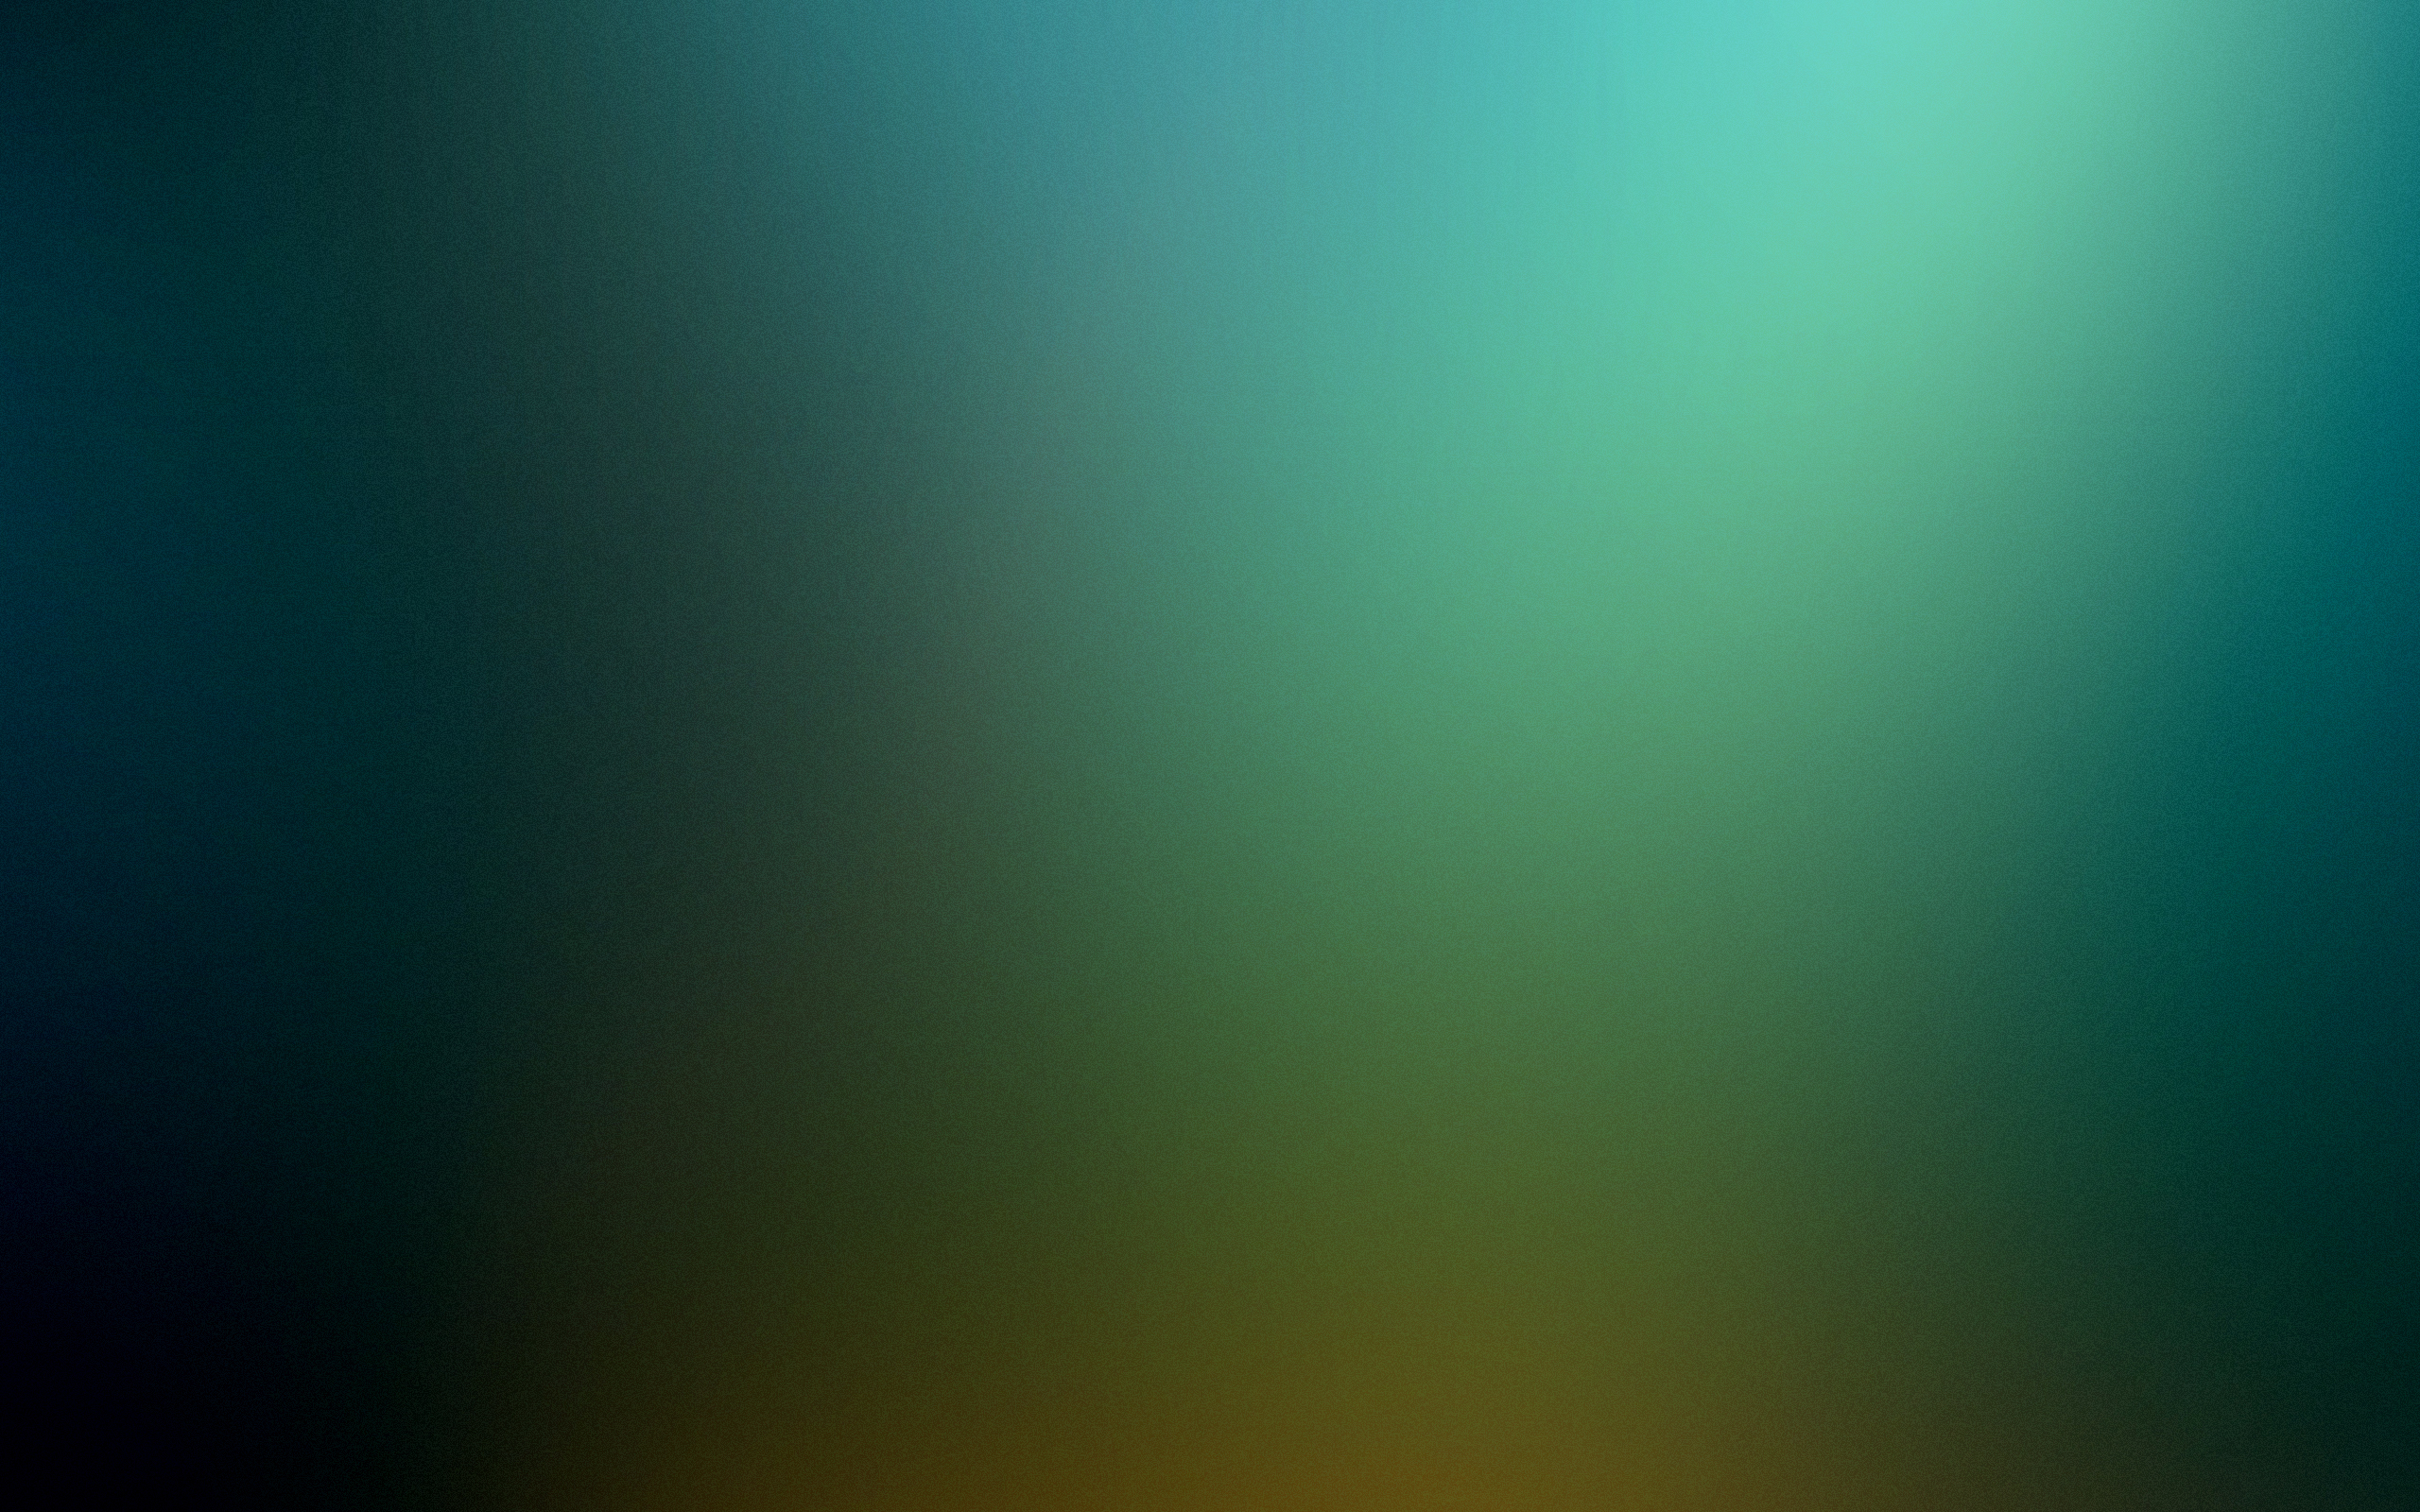 backgrounds texture wallpapers wallpaper texture color backgroundjpg 2560x1600